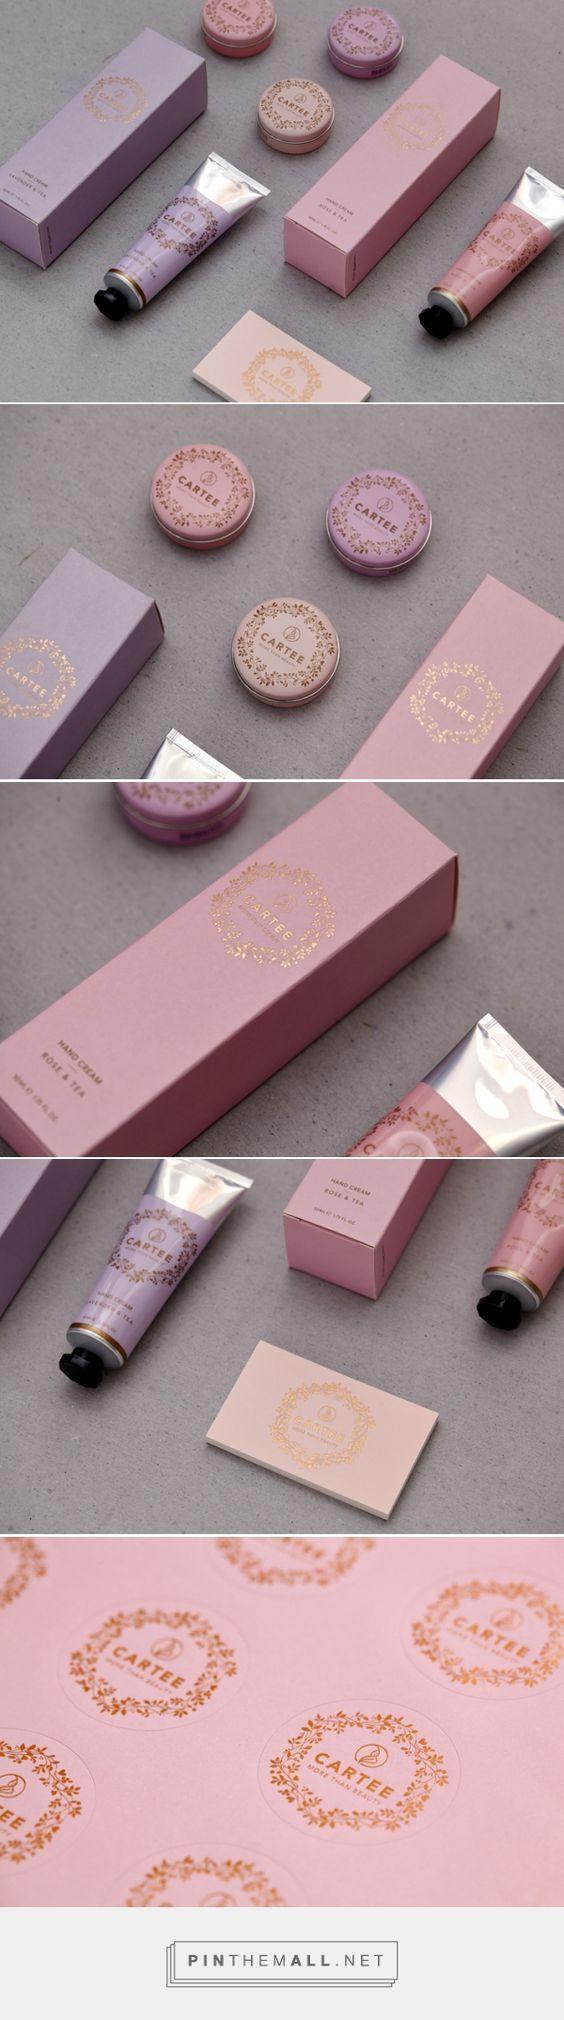 Cartee Packaging by Onion Design Associates   Fivestar Branding – Design and Branding Agency & Inspiration Gallery